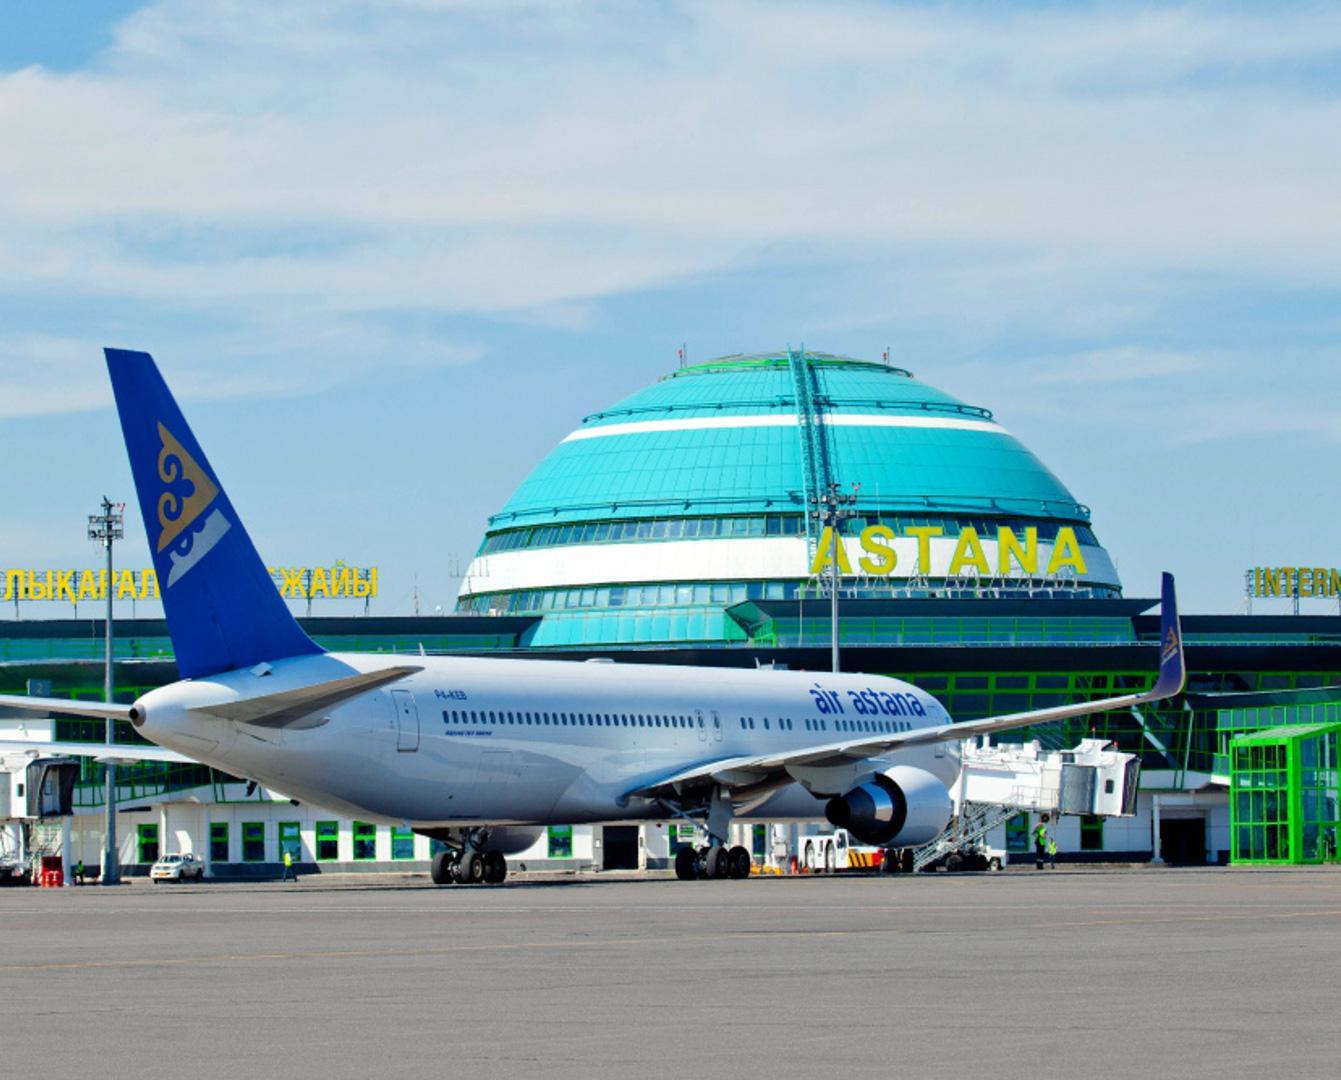 Фото аэропорта Air Astana